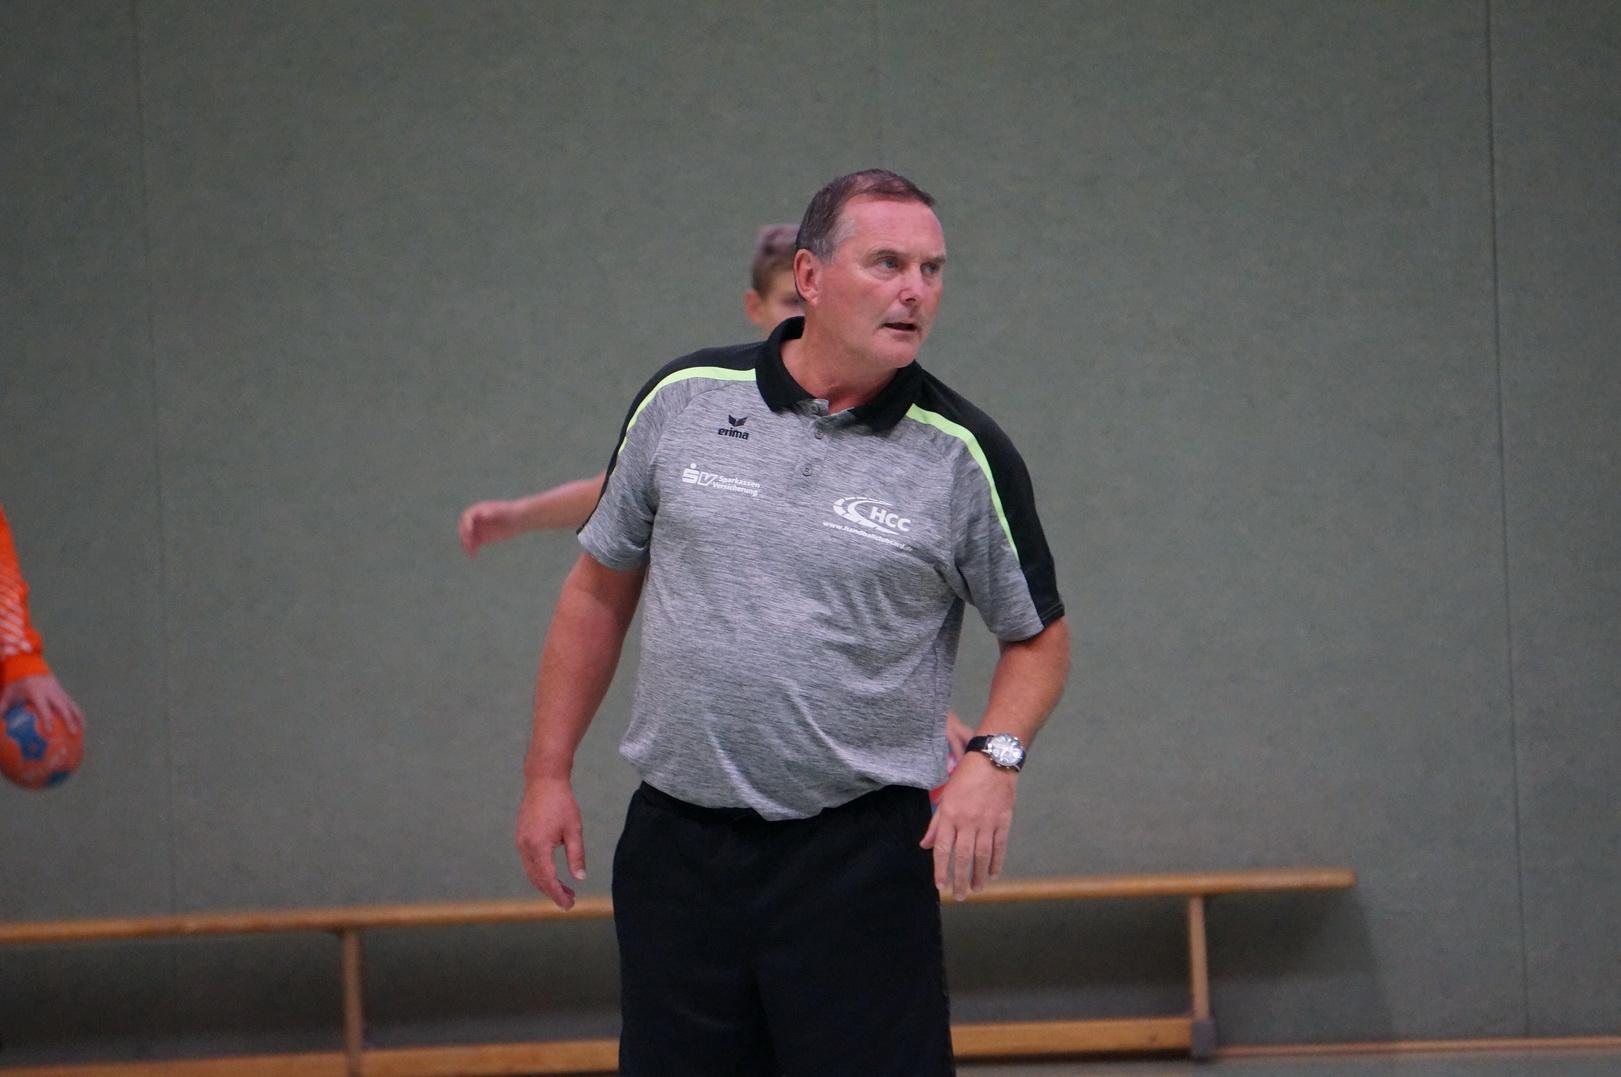 201808_Handballcamp_SDH_MG_051w